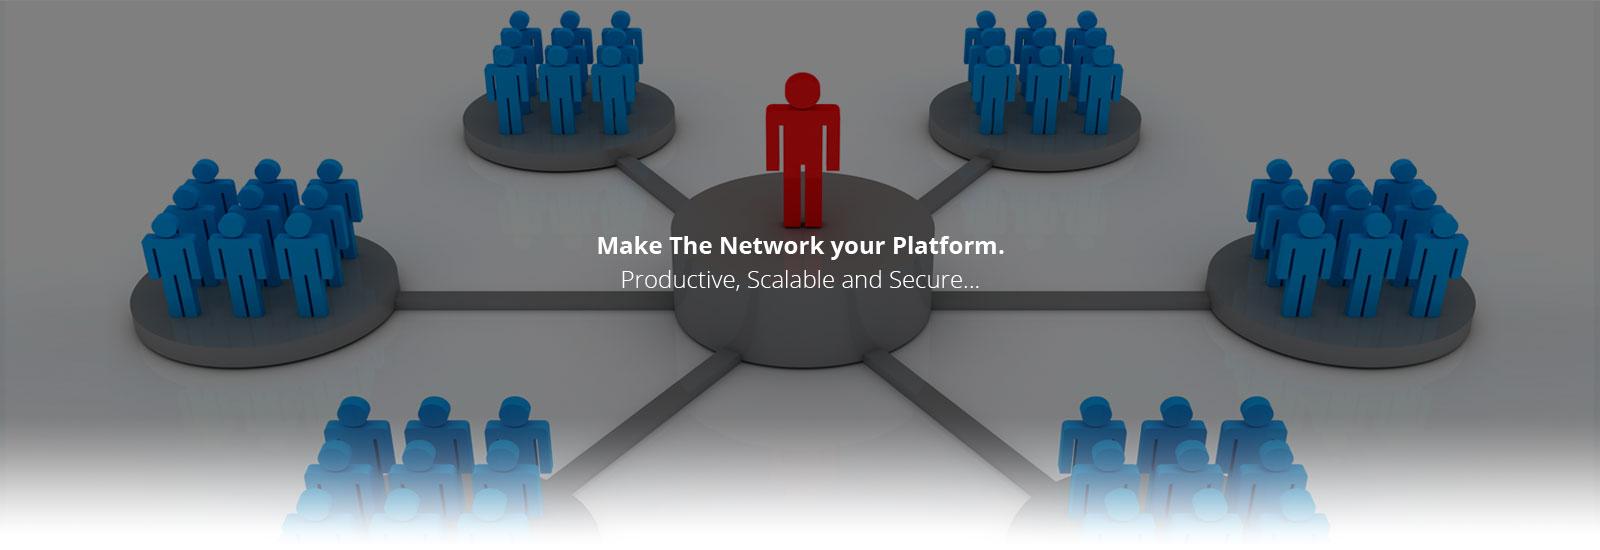 network your platform